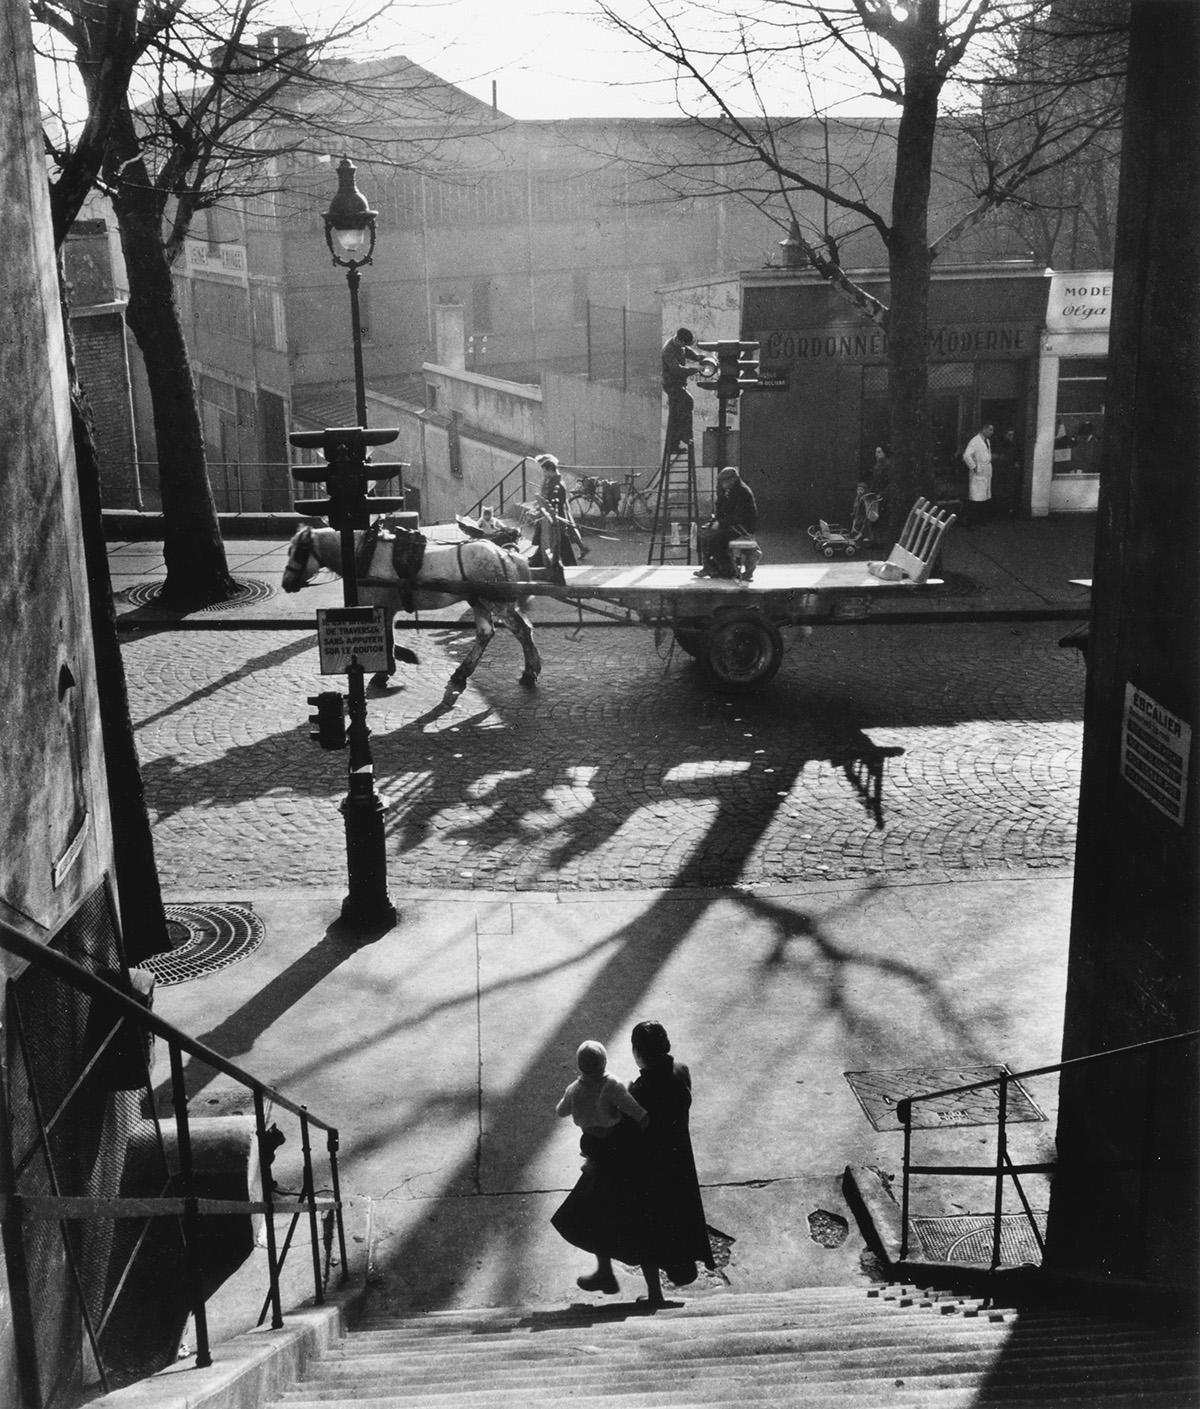 WILLY-RONIS-(1910-2009)-Avenue-Simon-Bolivar